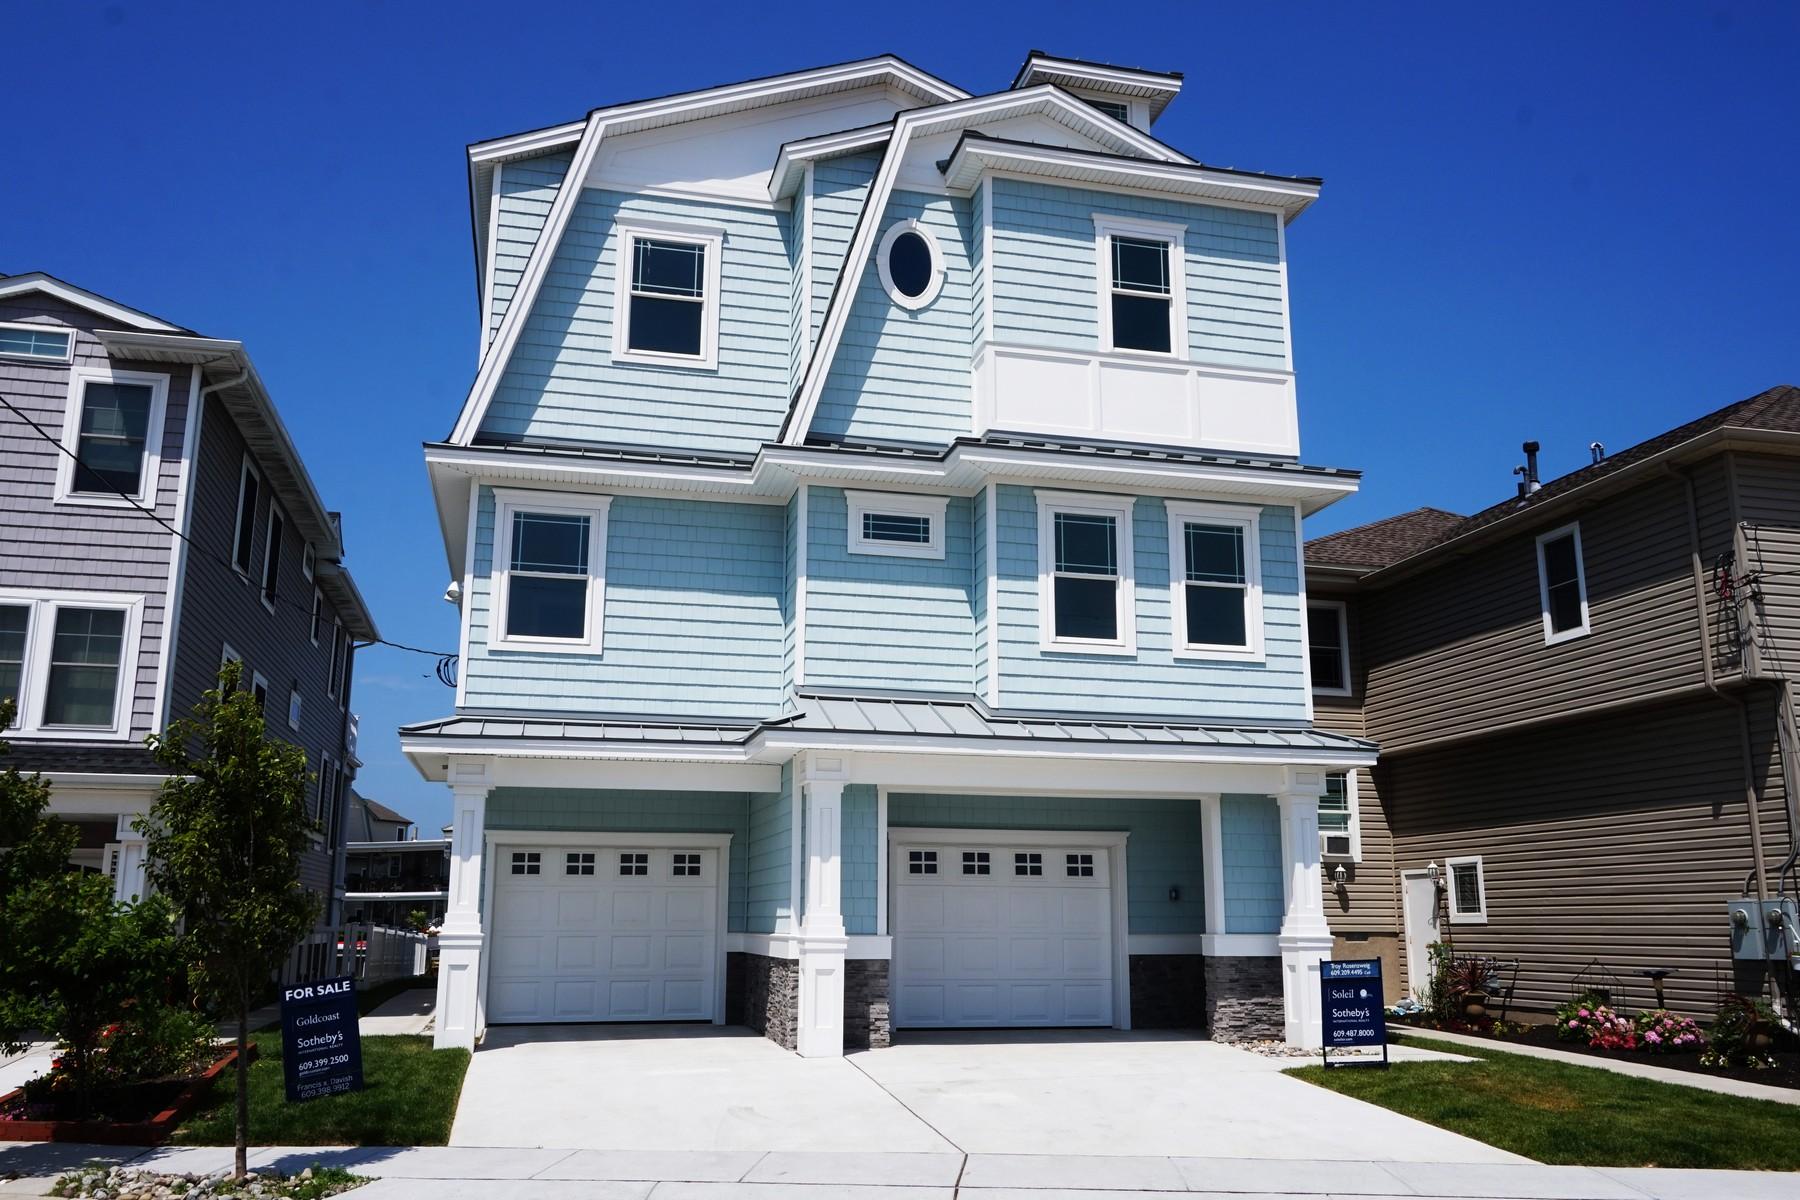 Duplex for Sale at Snug Harbor Lagoon Duplex 14 W Revere Place Duplex Ocean City, 08226 United States